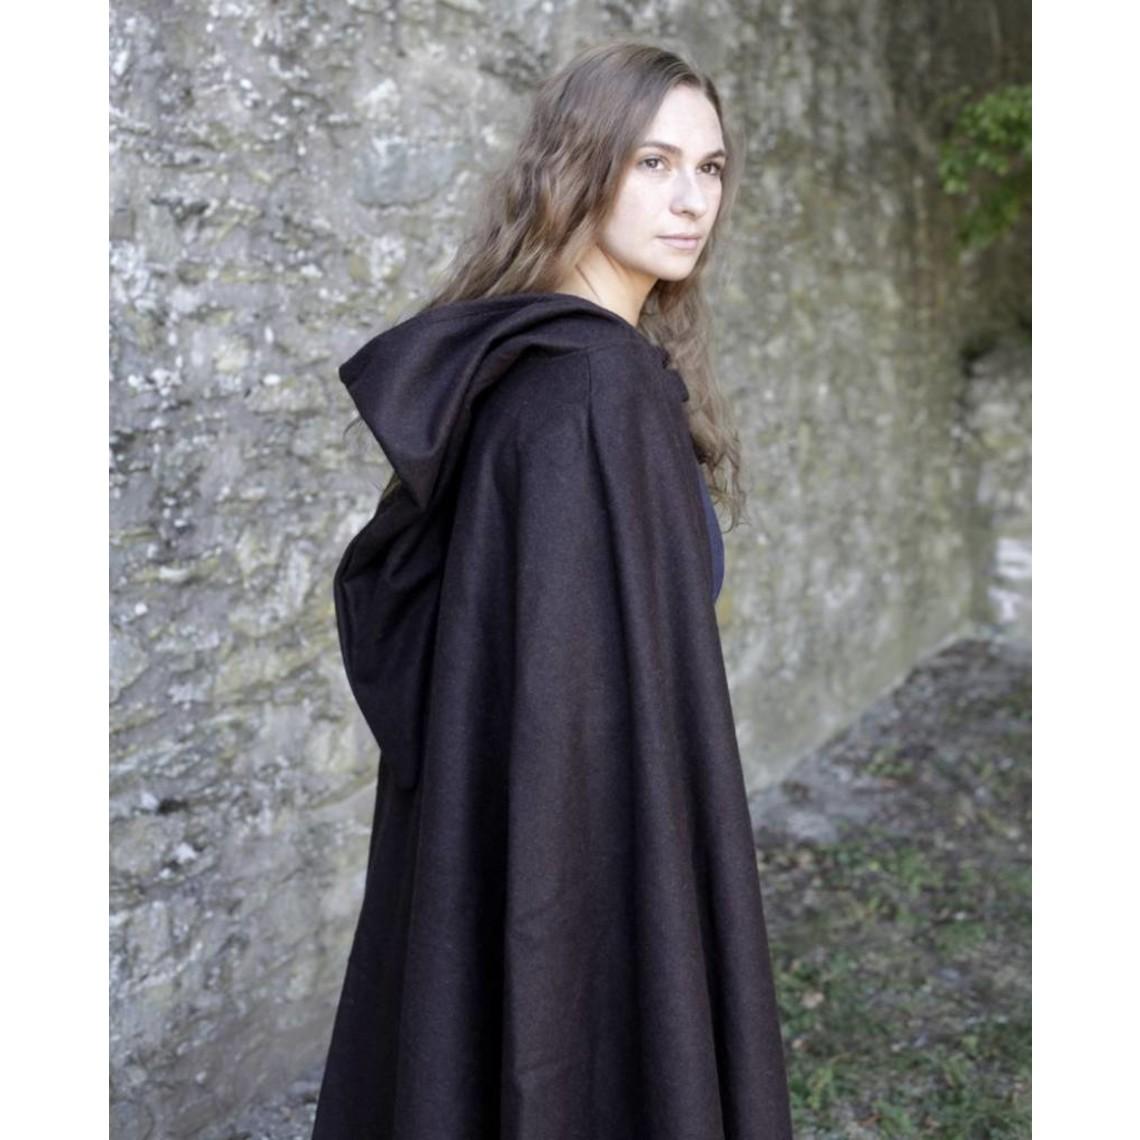 Burgschneider giacca Hibernus, marrone